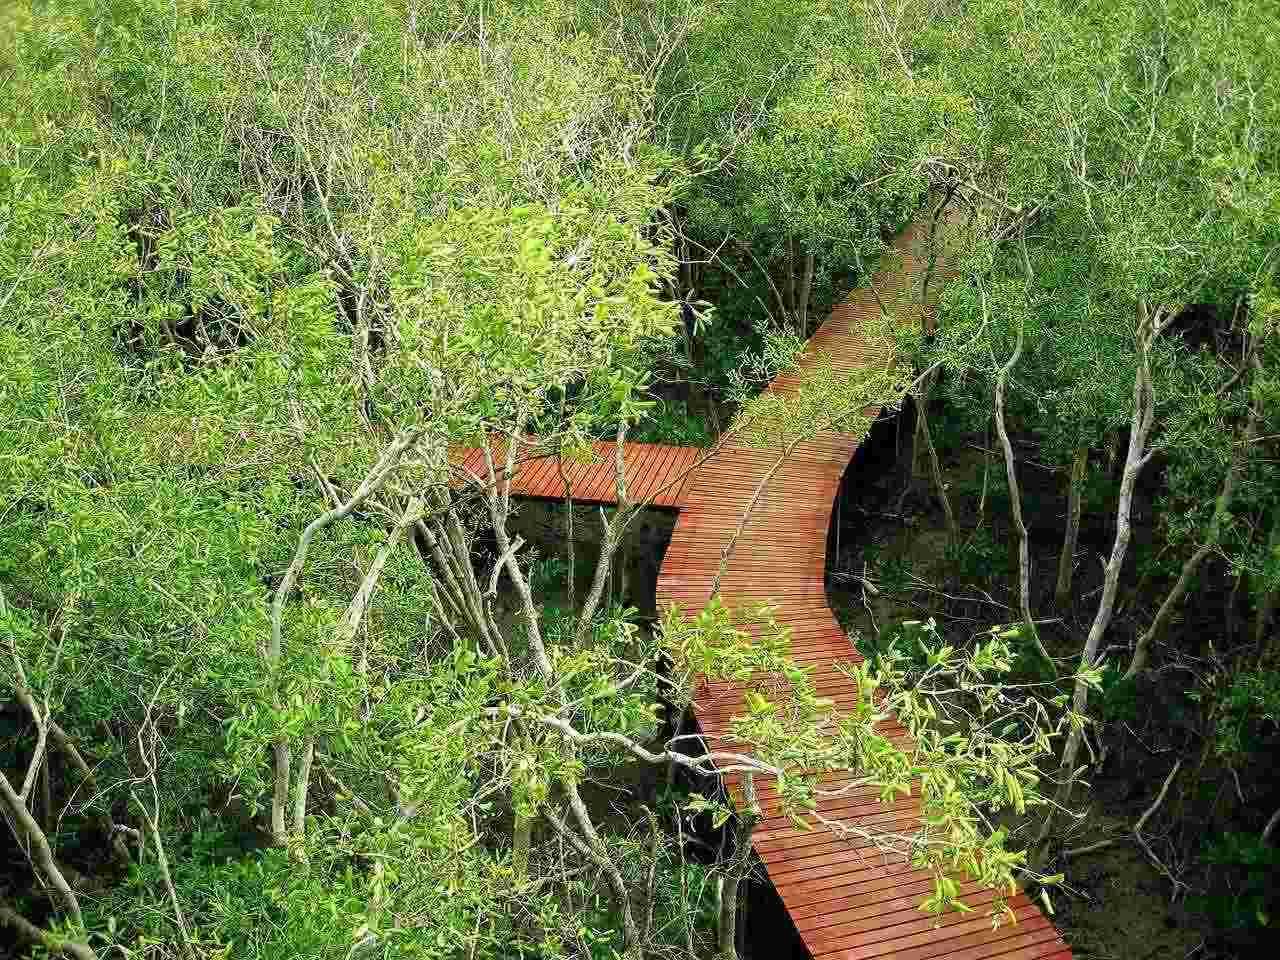 Wisata Alam Hutan Mangrove Rembang Tukang Info Indonesia Map Directory